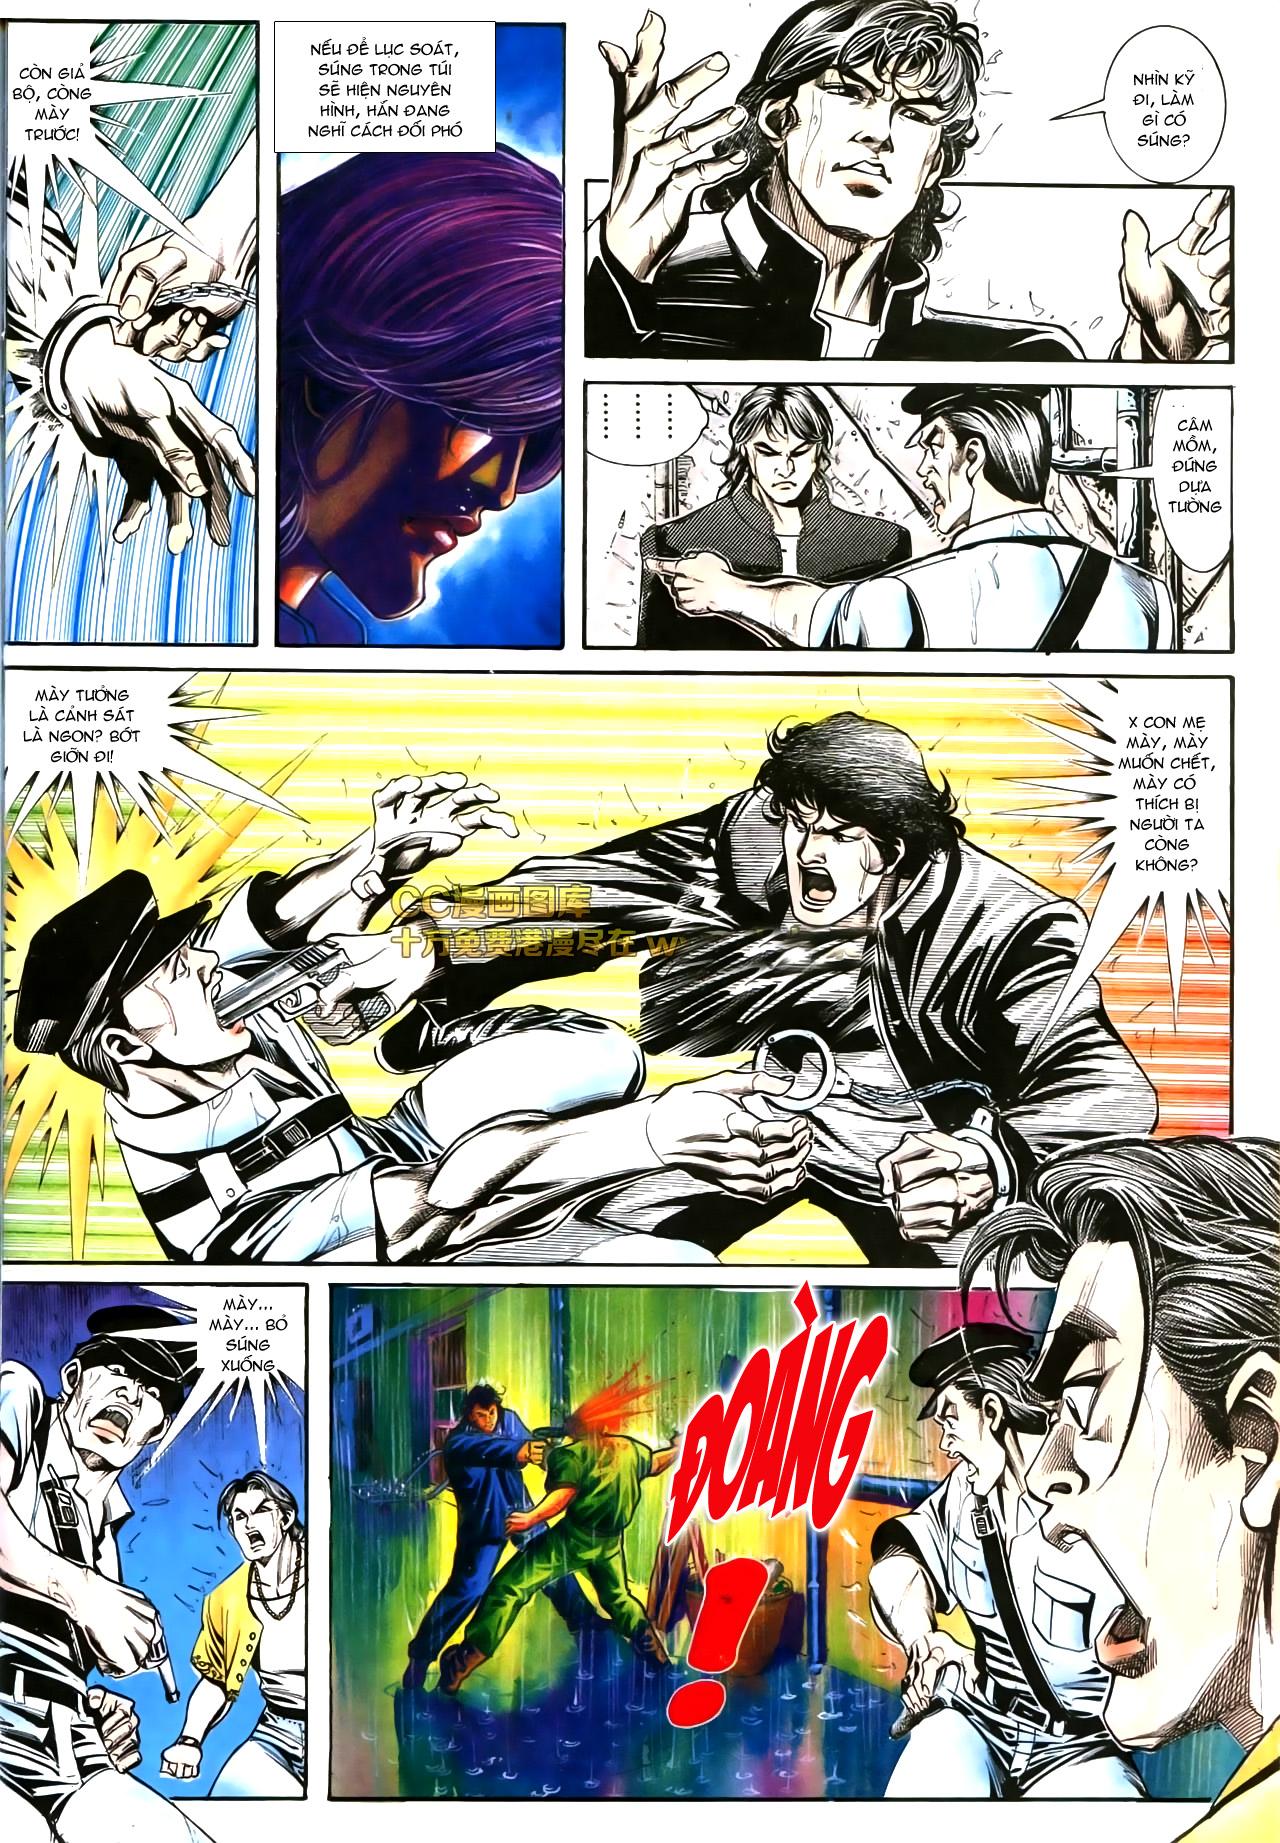 Người Trong Giang Hồ chapter 173: da ngựa bọc thây trang 24